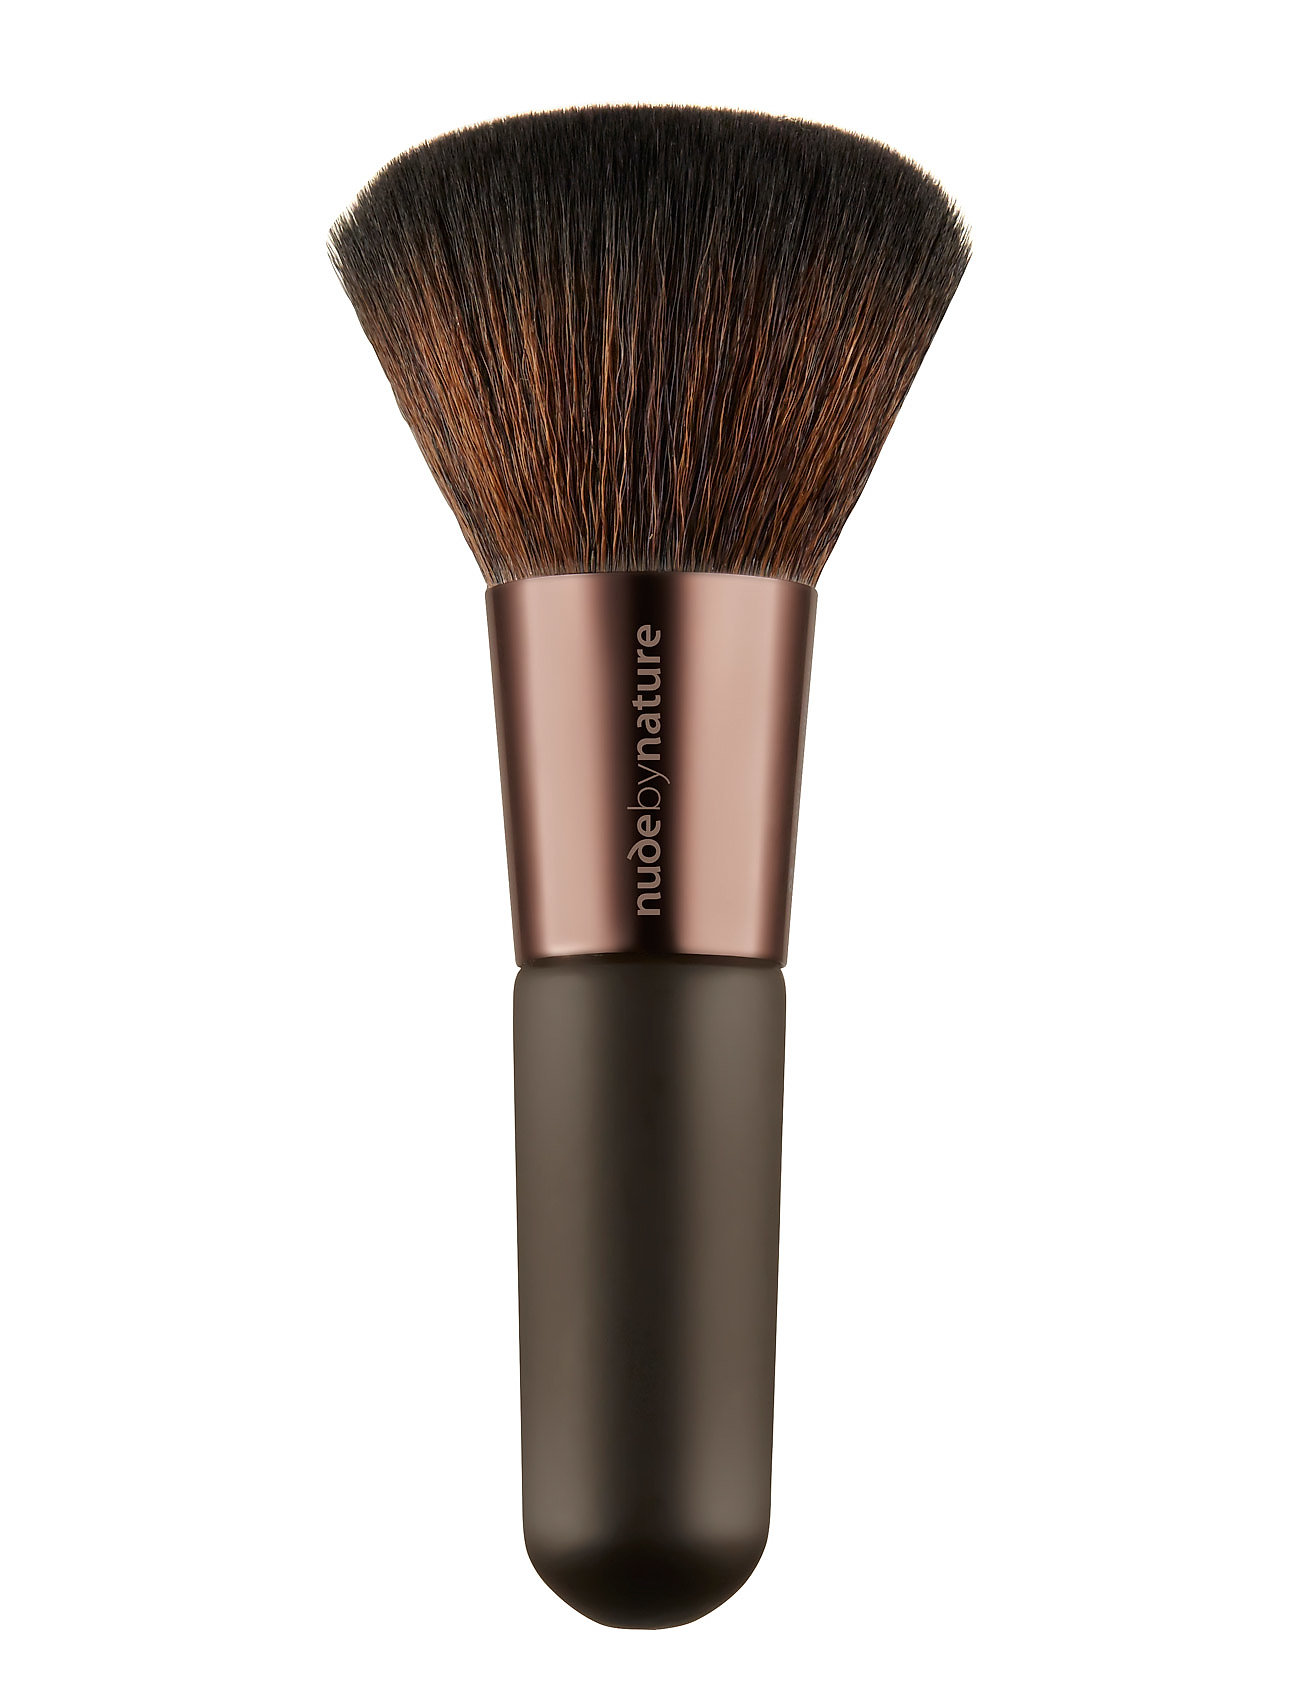 Image of Brushes 03 Flawlessbrush Ansigtsbørste Makeup Nude Nude By Nature (2778815197)